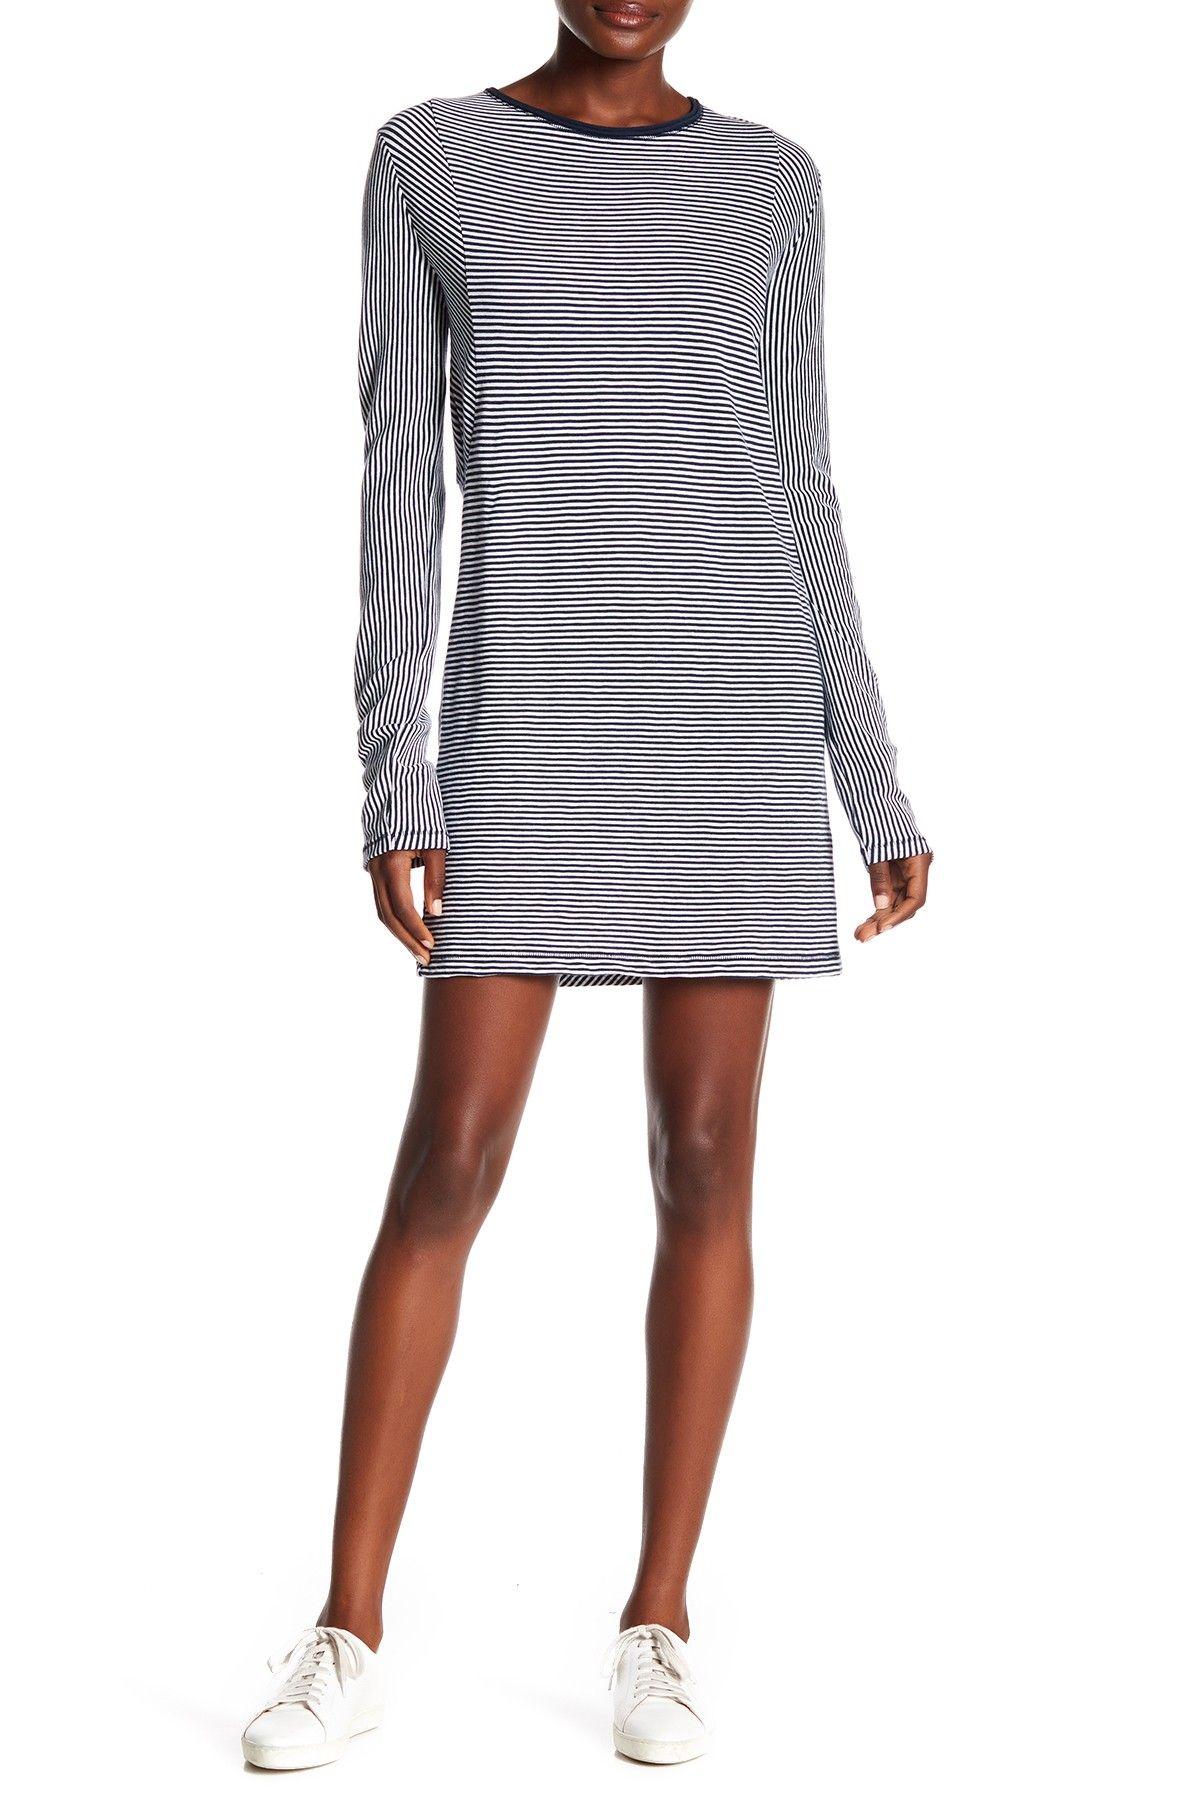 Striped Knit Dress By Rag Bone On Nordstrom Rack Striped Knit Dress Striped Knit Knit Dress [ 1800 x 1200 Pixel ]